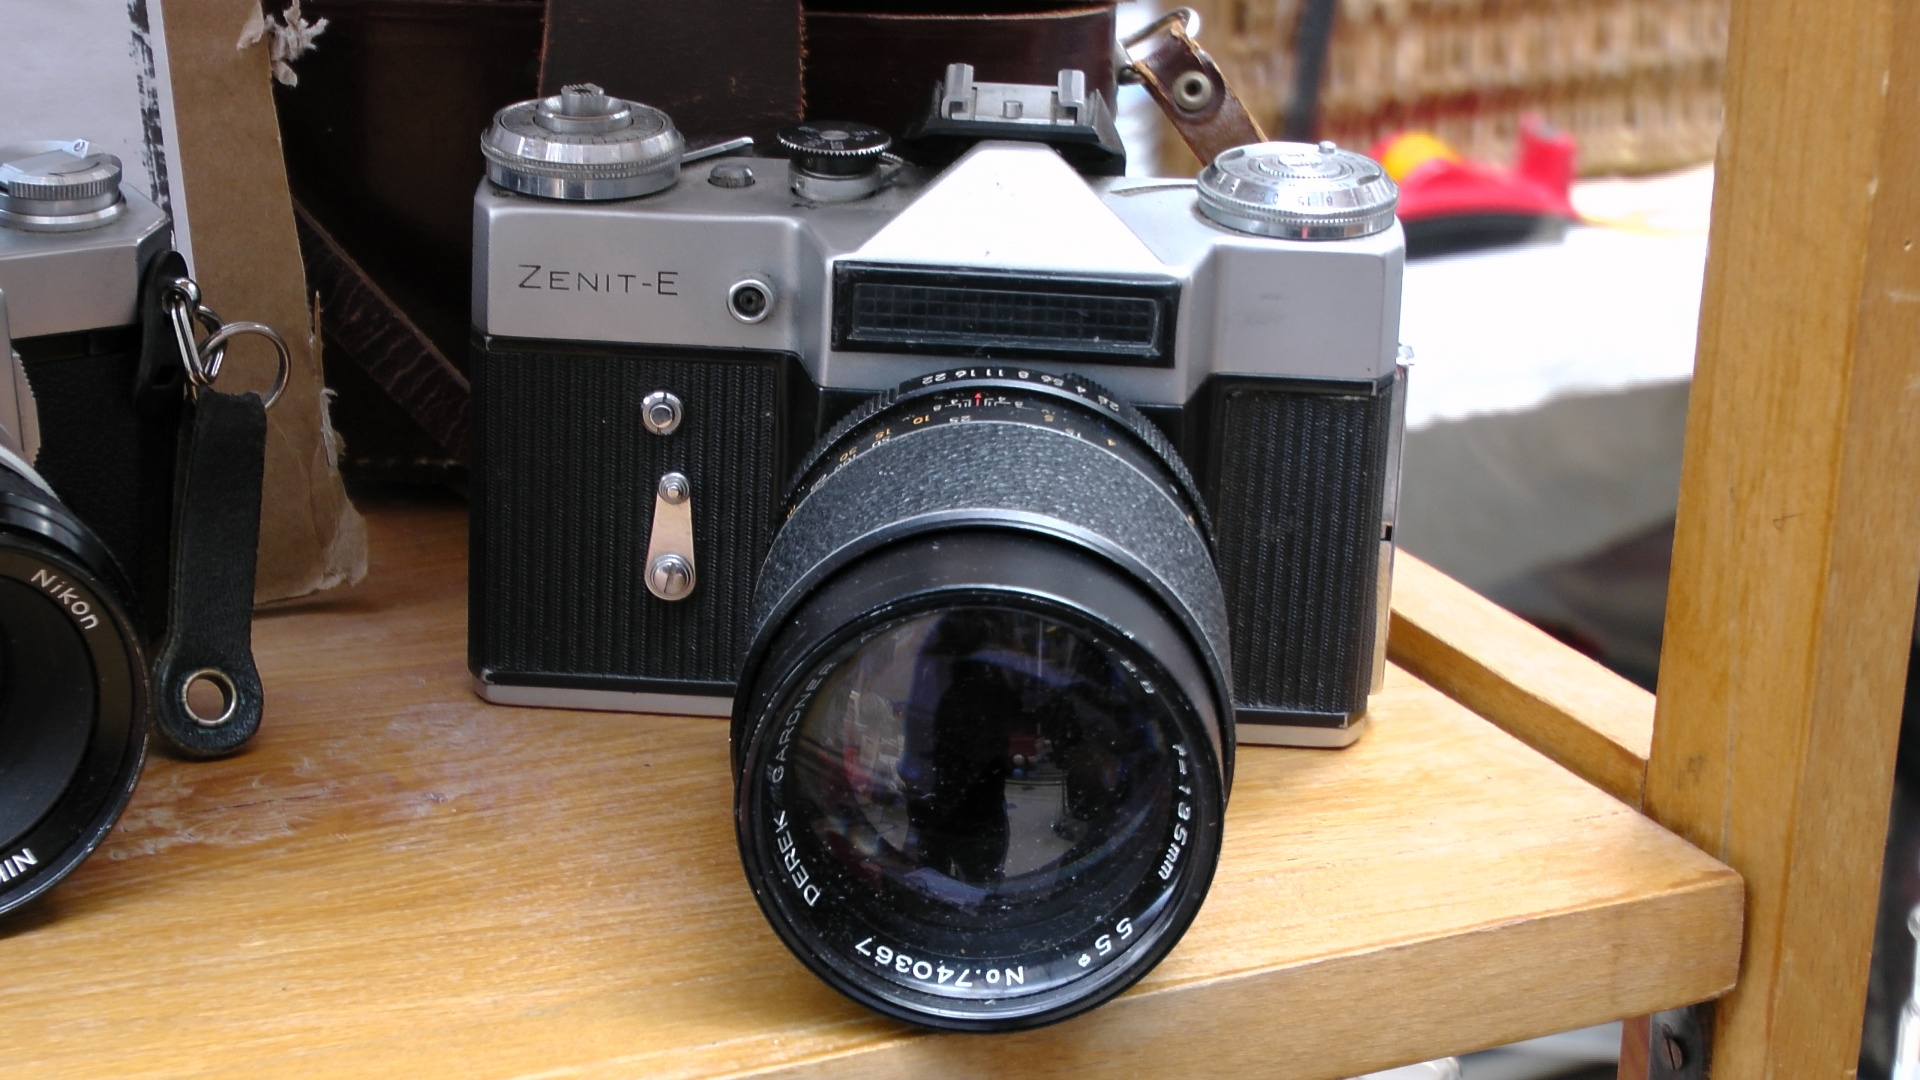 Camera,zenit,e,35mm,cameras - free photo from needpix com